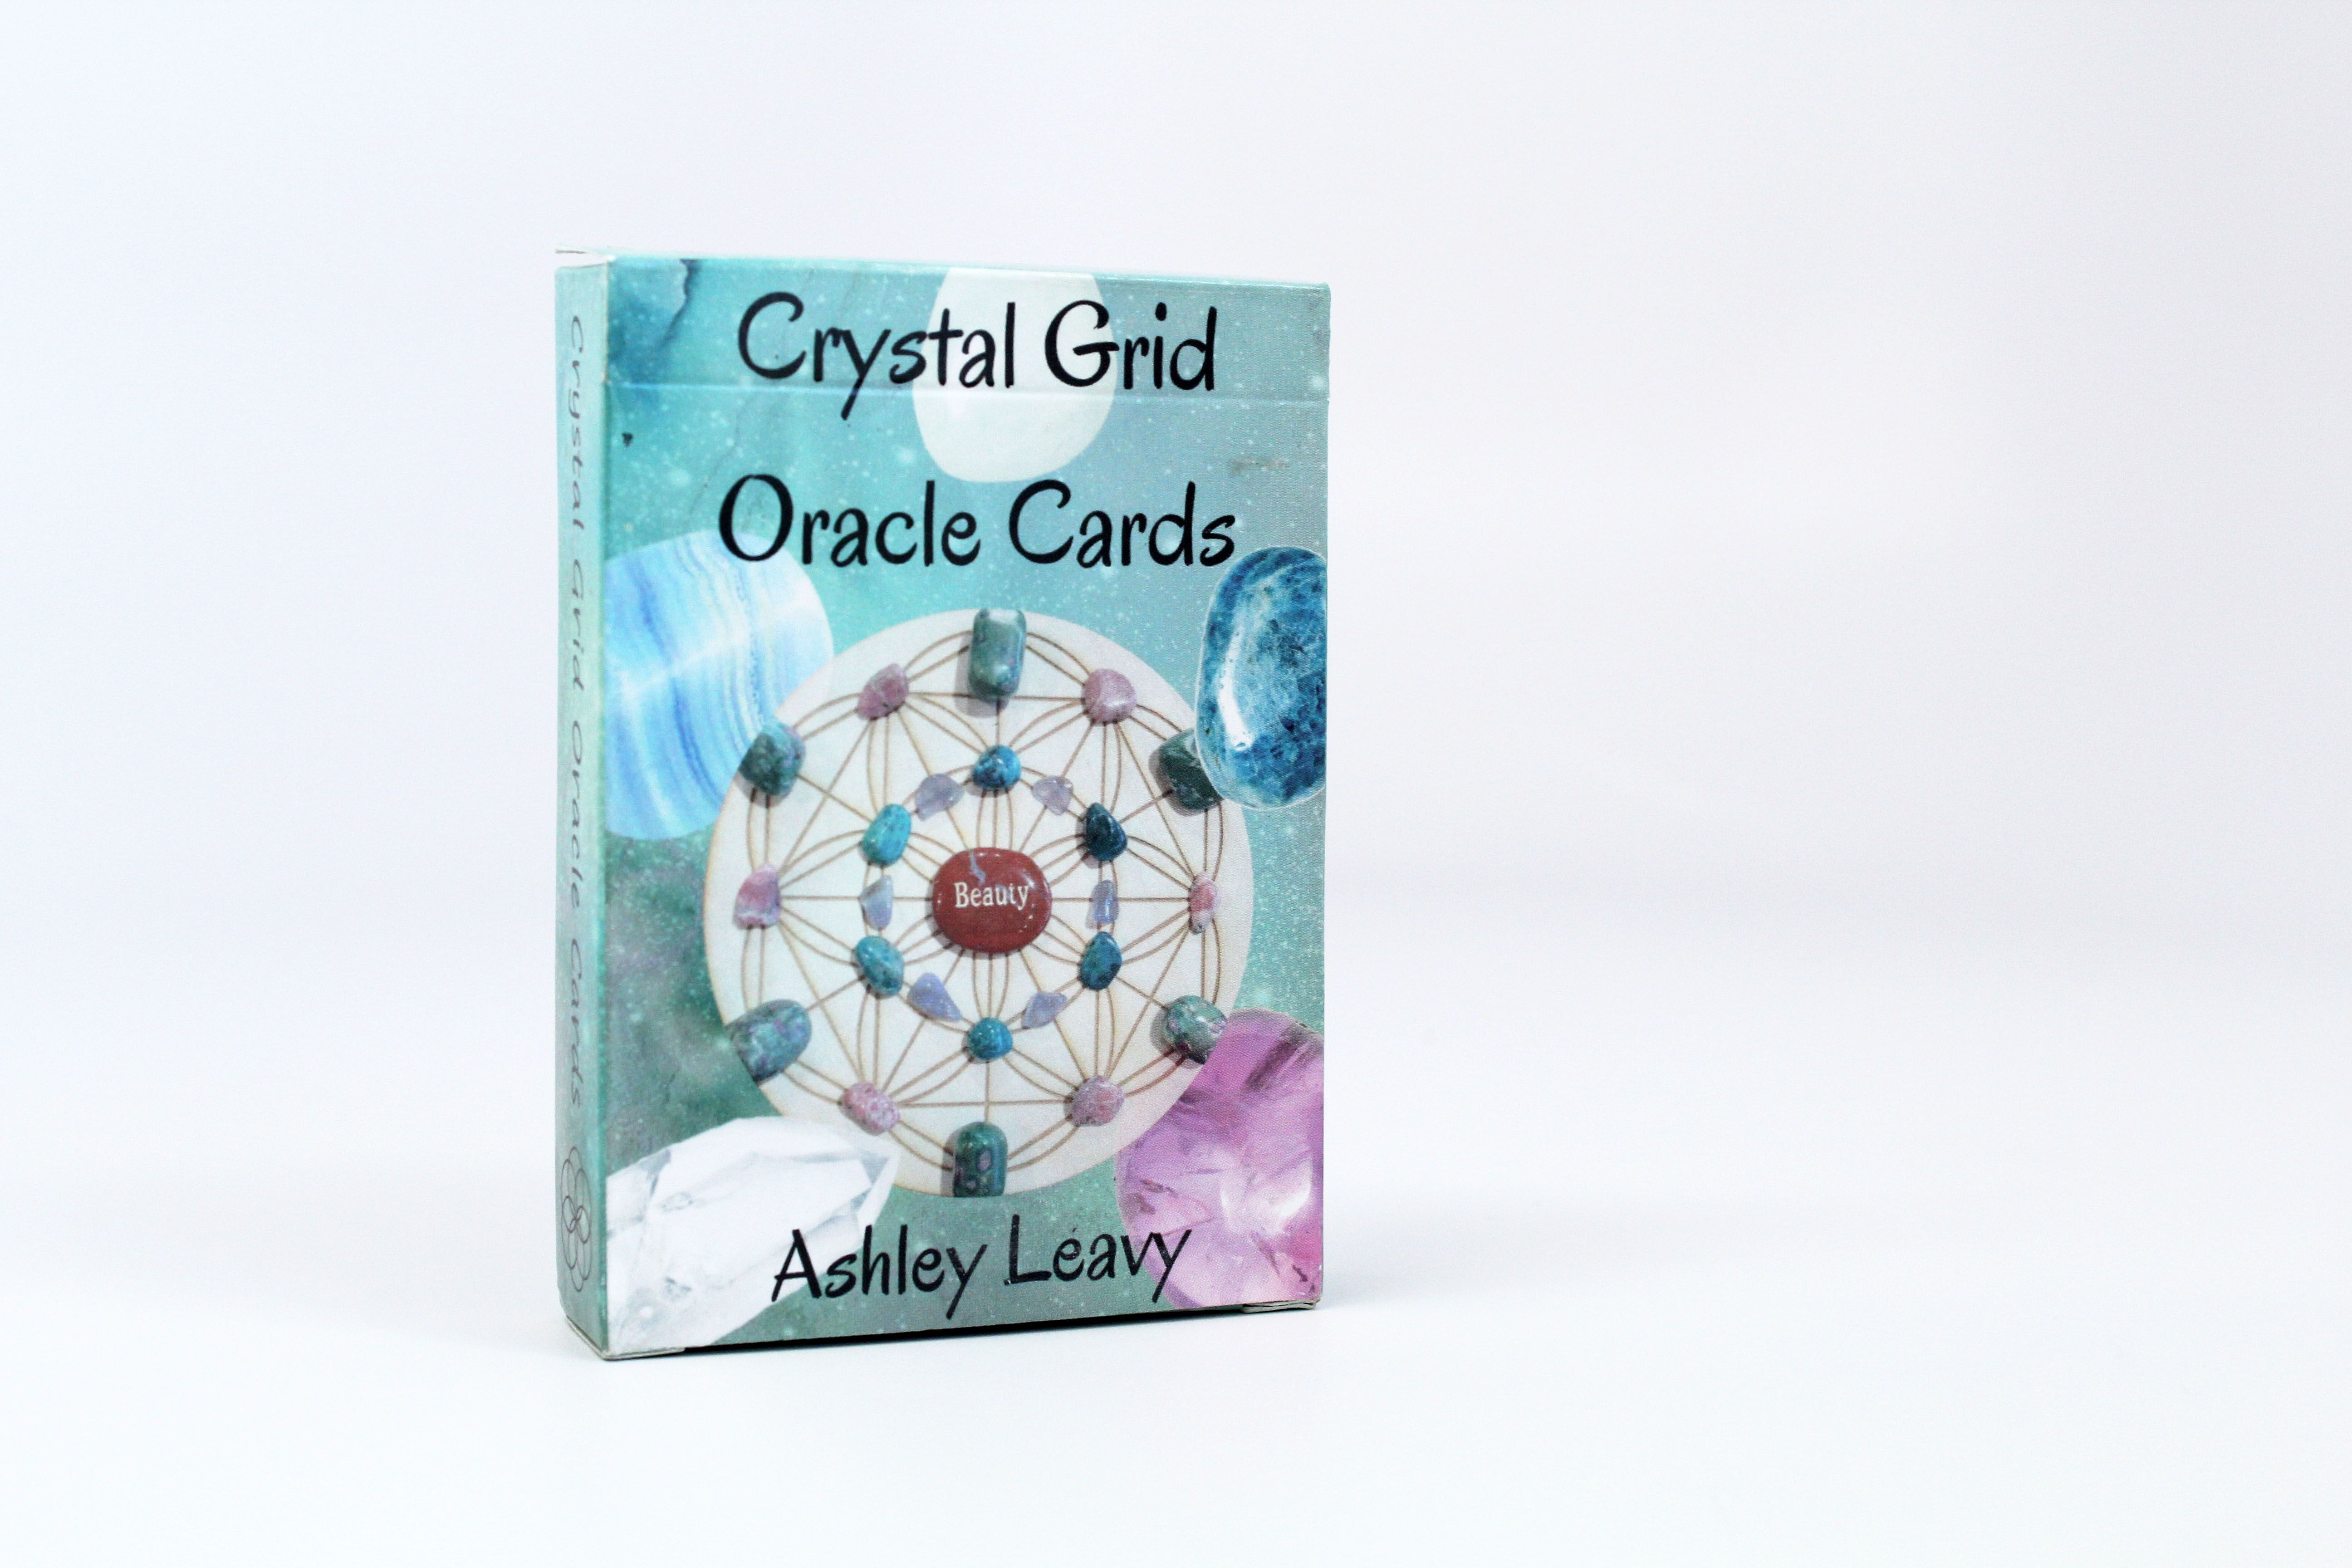 Crystal Grid Oracle Cards | Crystal Healing Resources